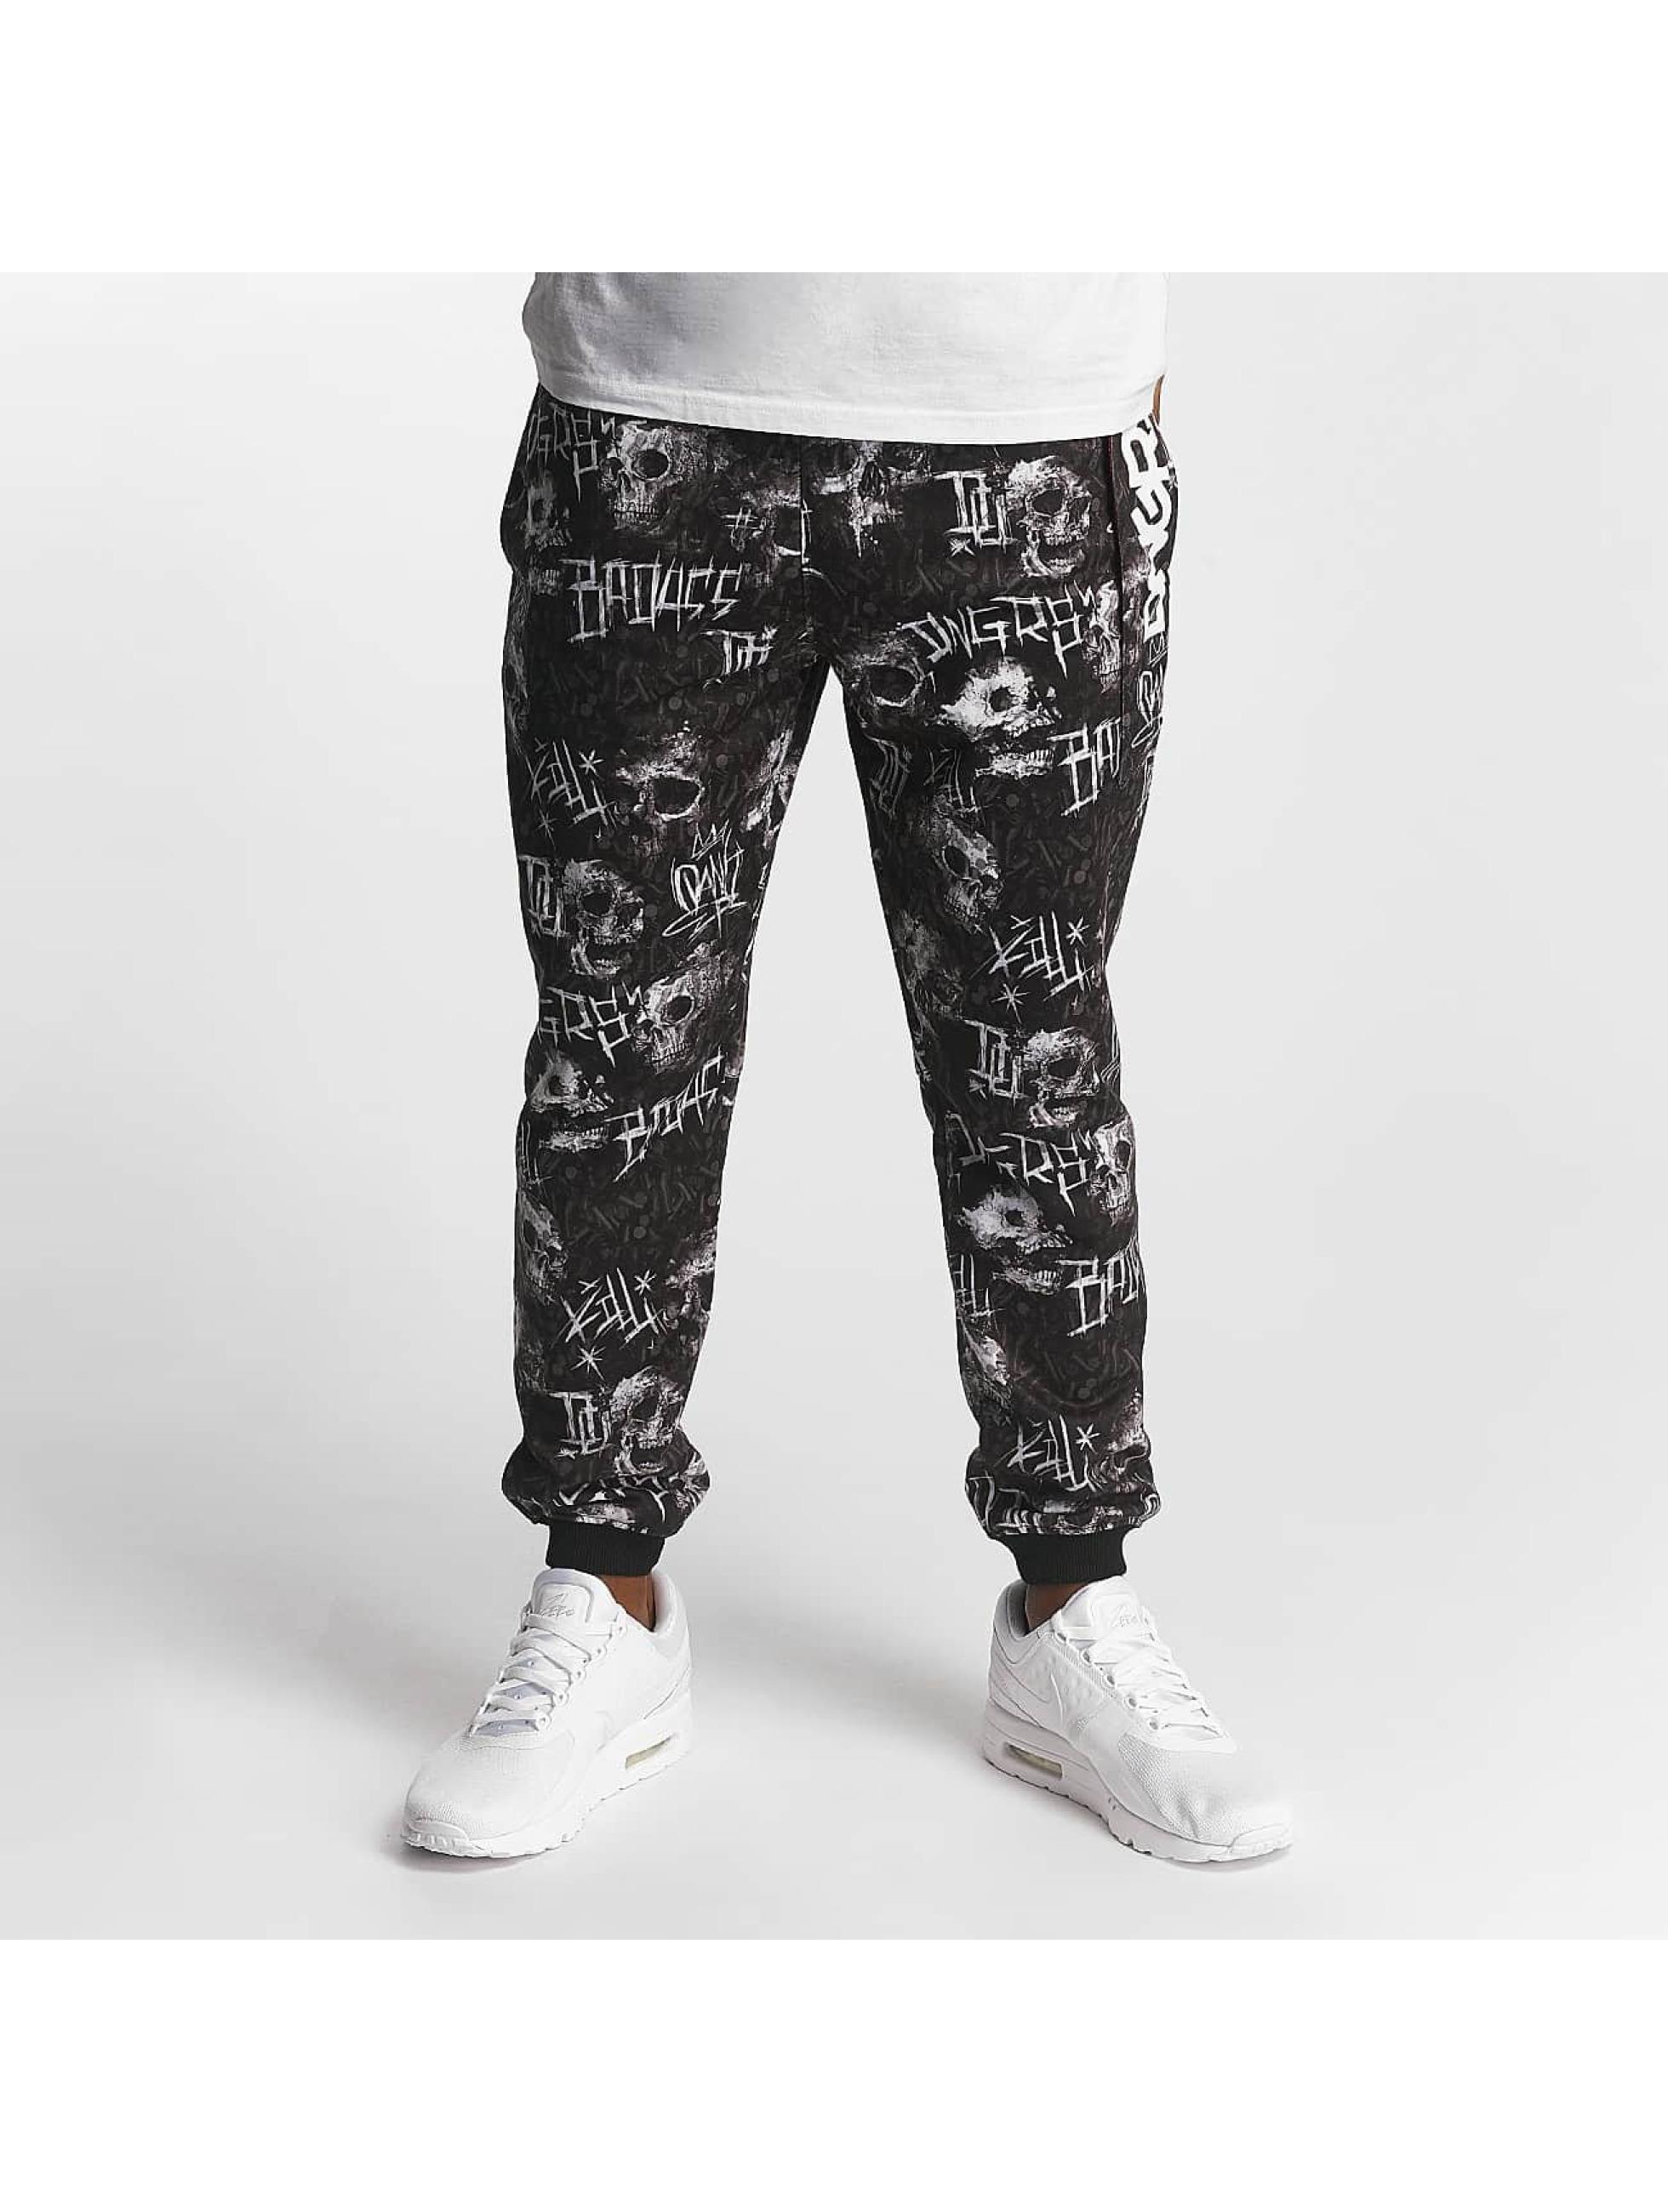 Dangerous DNGRS / Sweat Pant Bulet in black 3XL